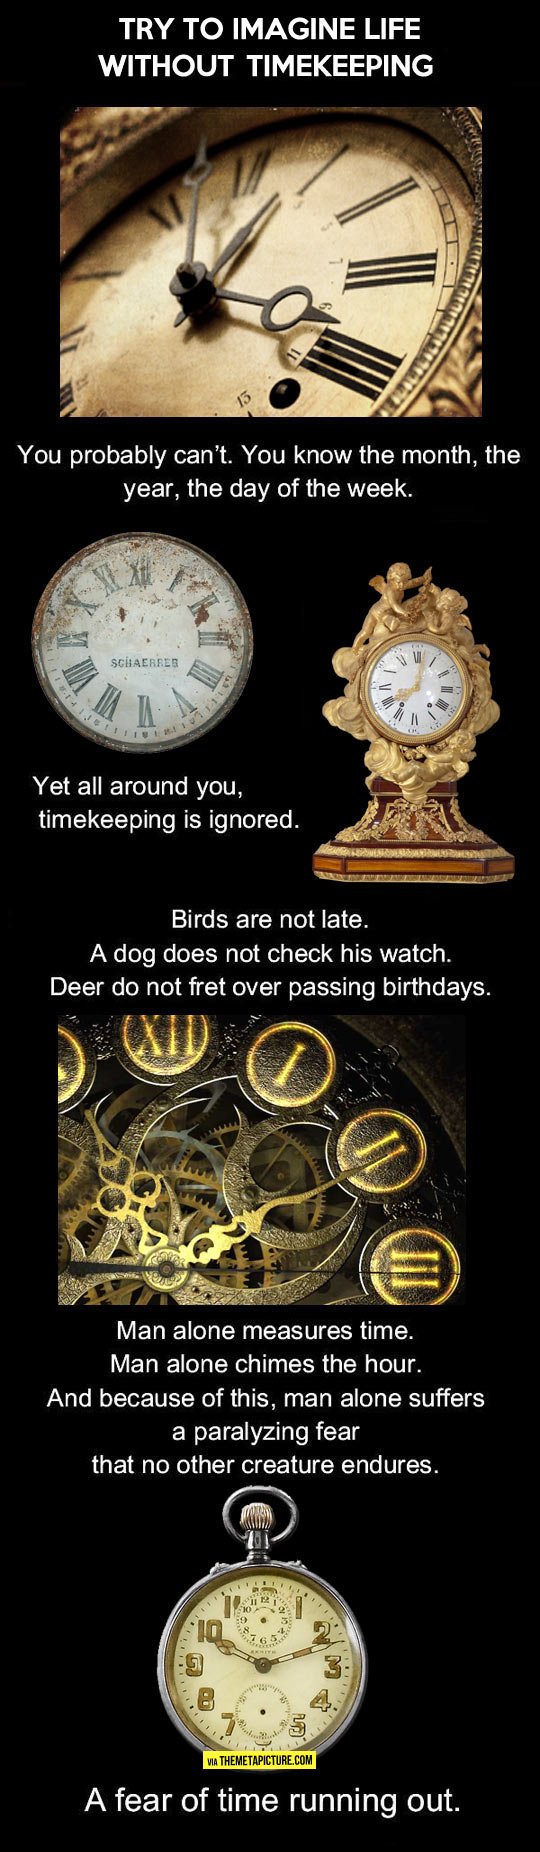 cool-timekeeping-life-animals-hours